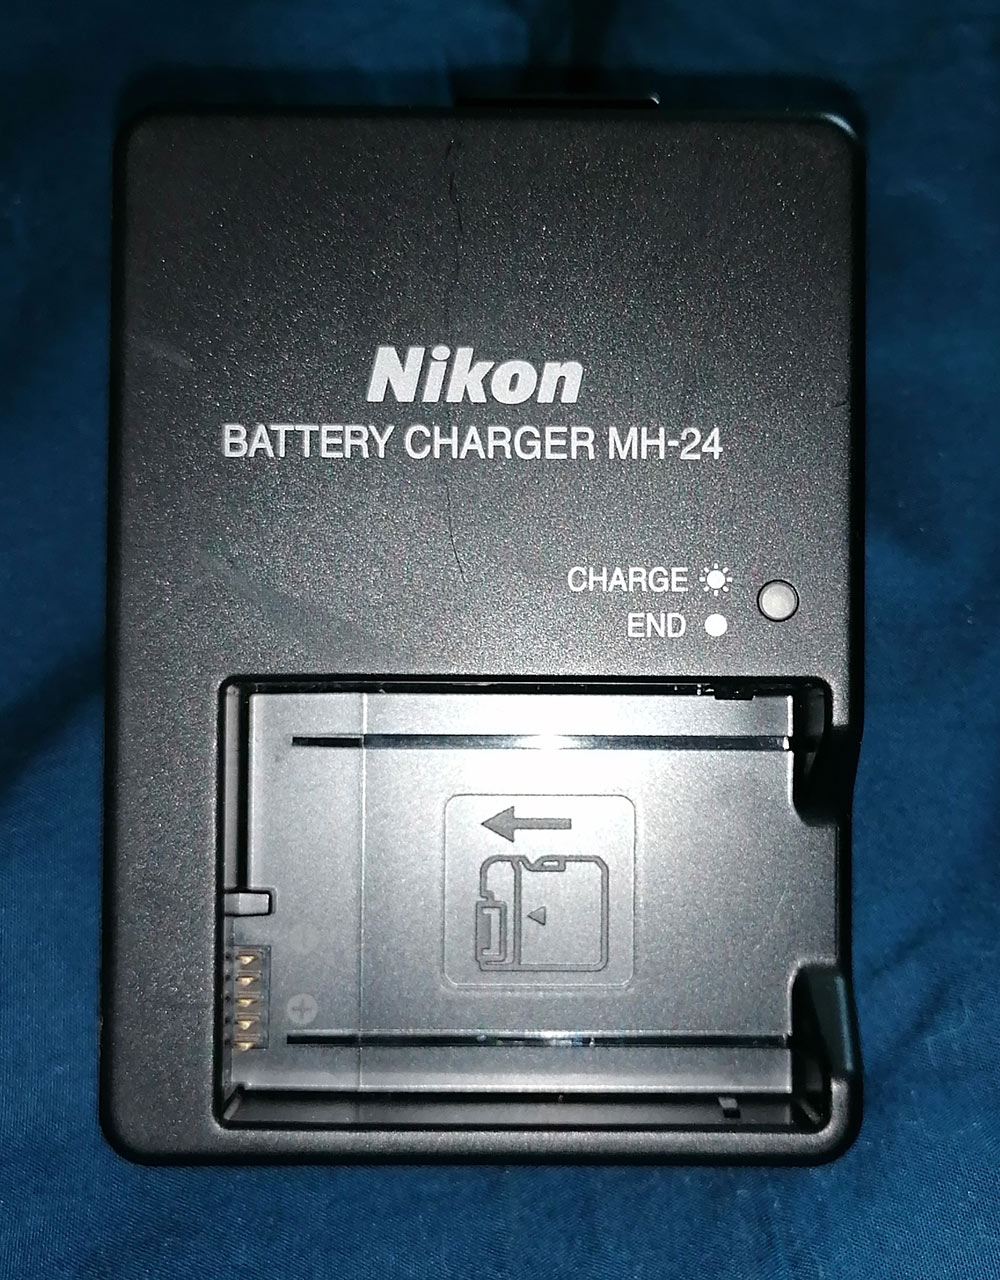 Nikon MH-24 Charger for EN-EL14 Li-ion Battery for Nikon D3100 DSLR,D5100 DSLR,P7000 Digital Cameras